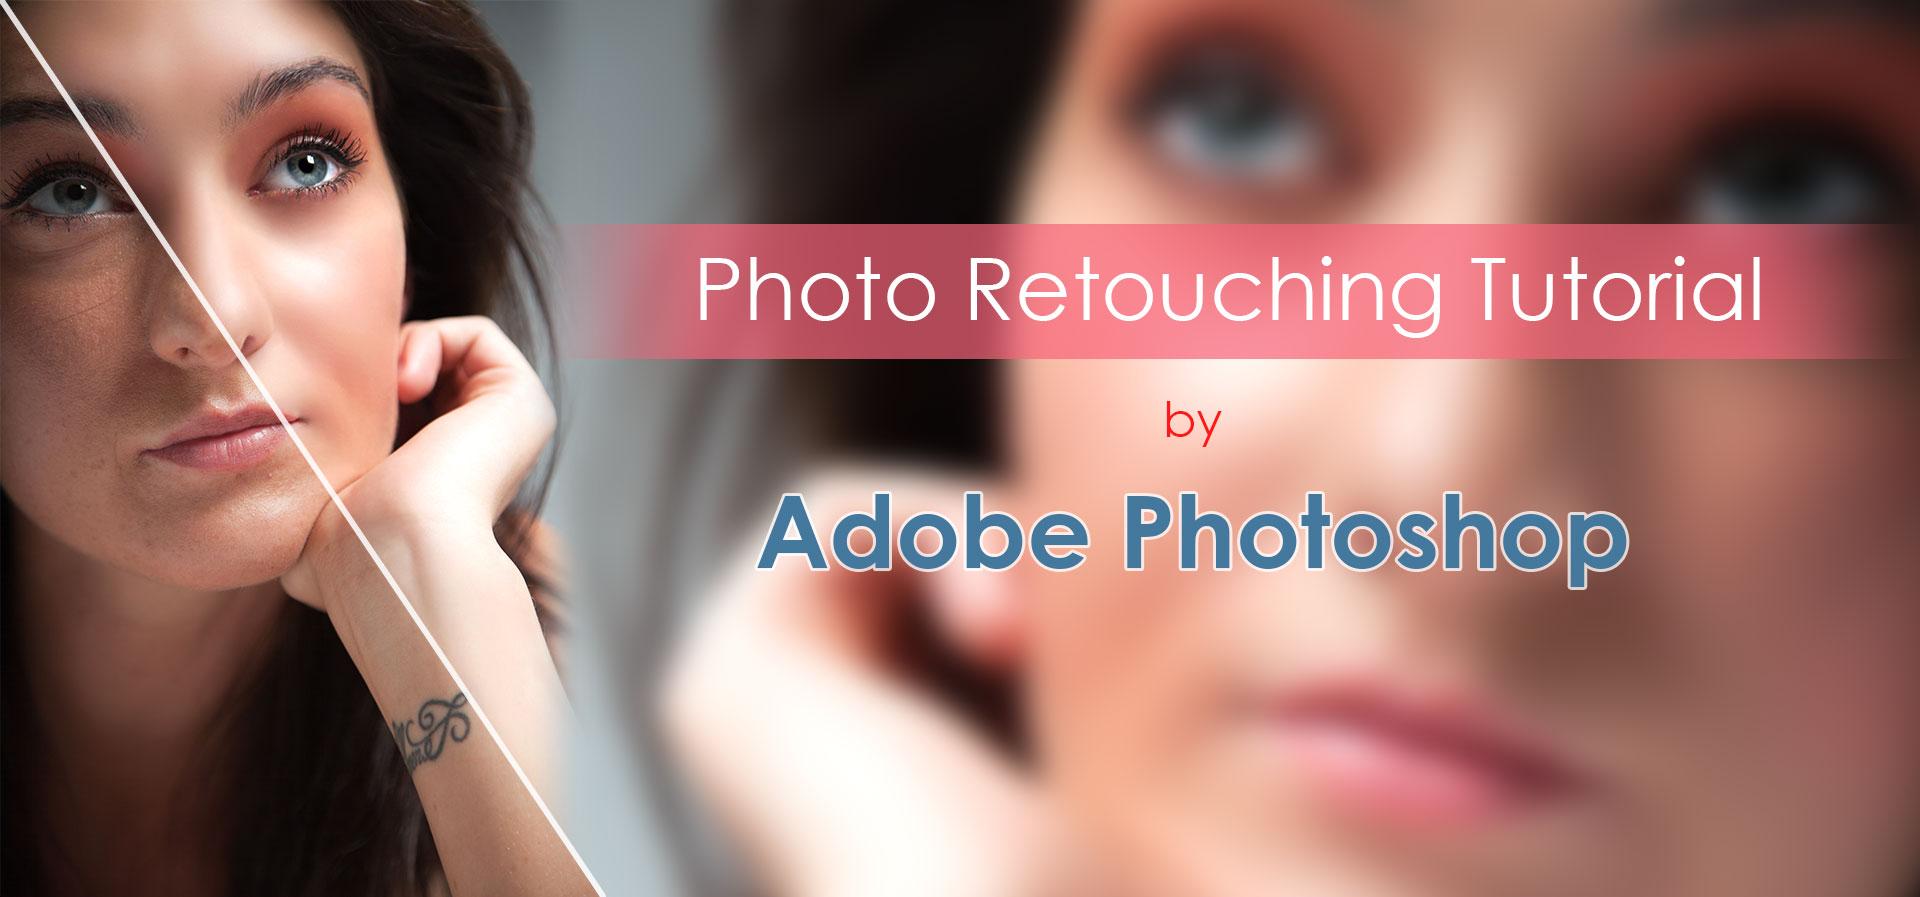 Photo-Retouching-Tutorial-by-Adobe-Photoshop